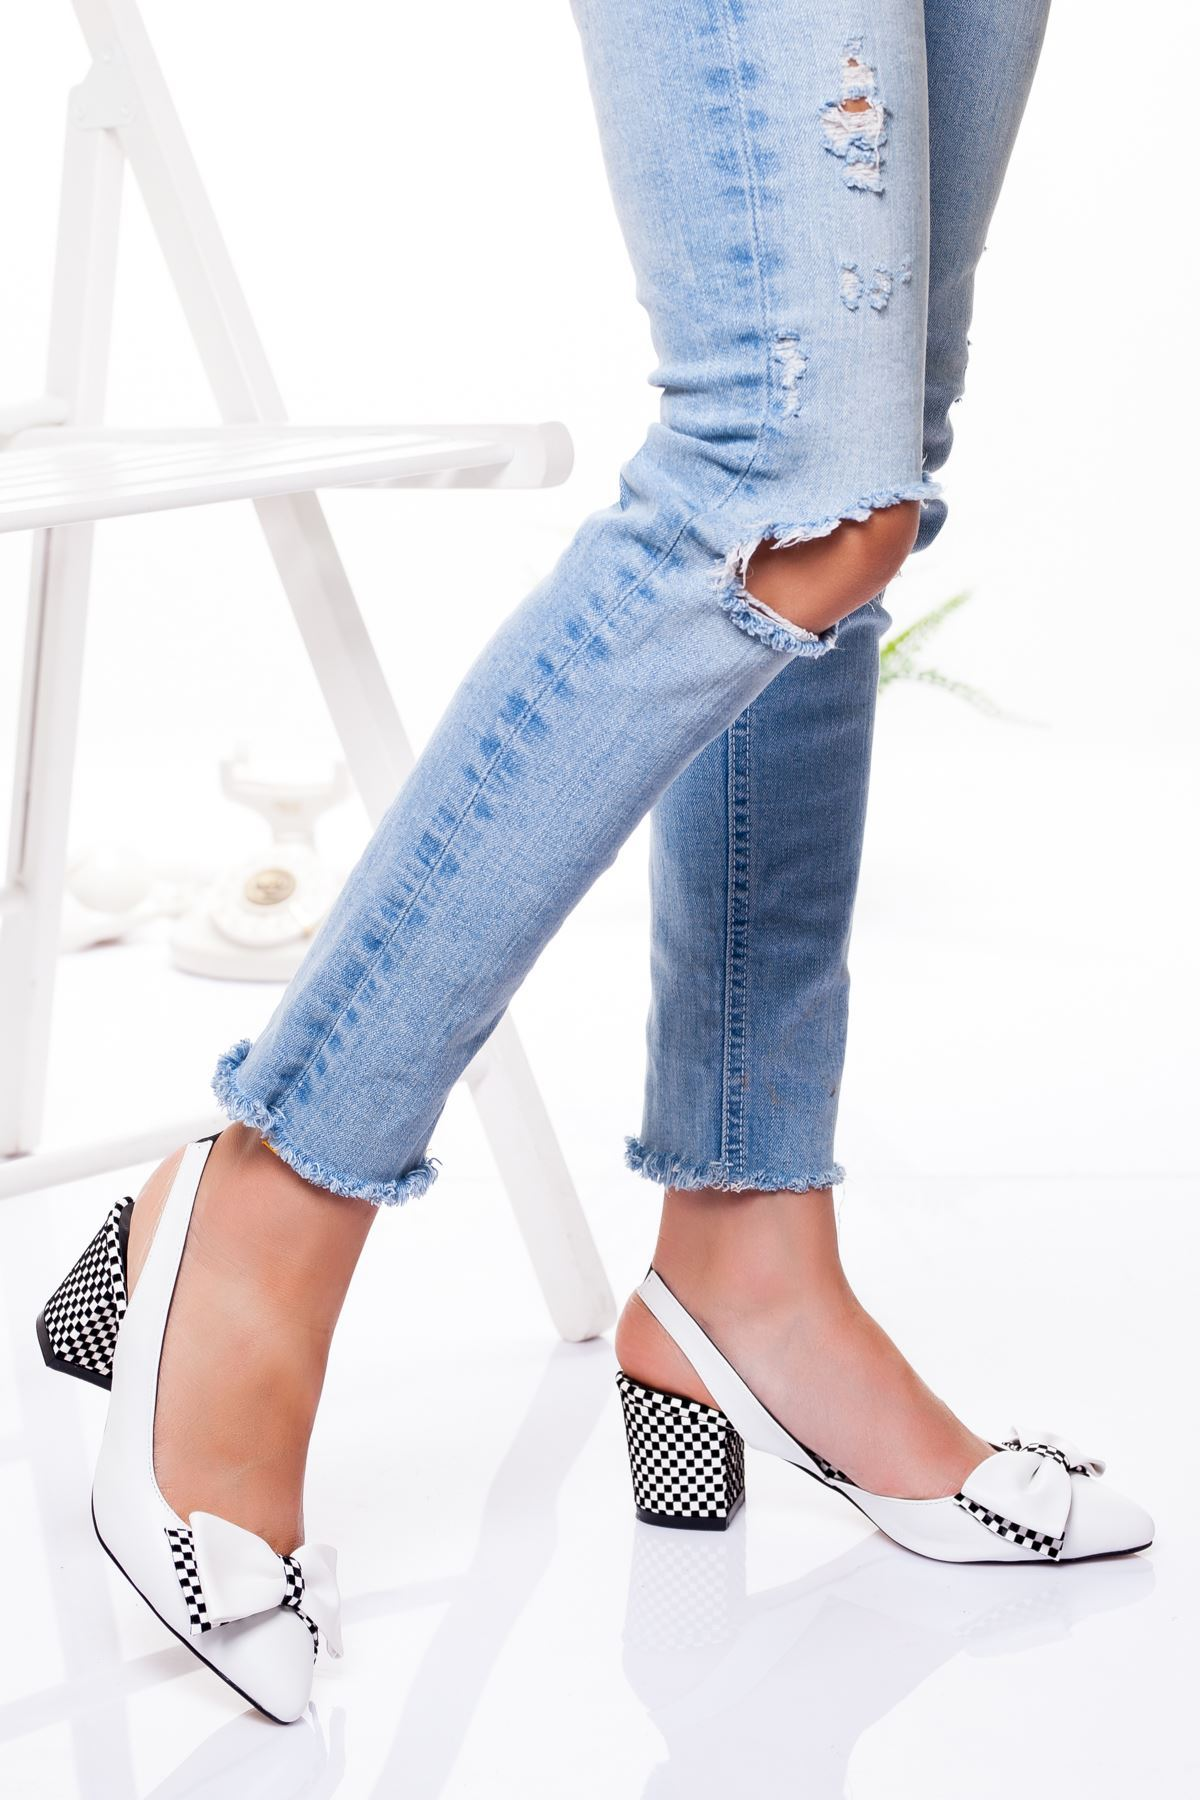 Chano Topuklu Ayakkabı BEYAZ